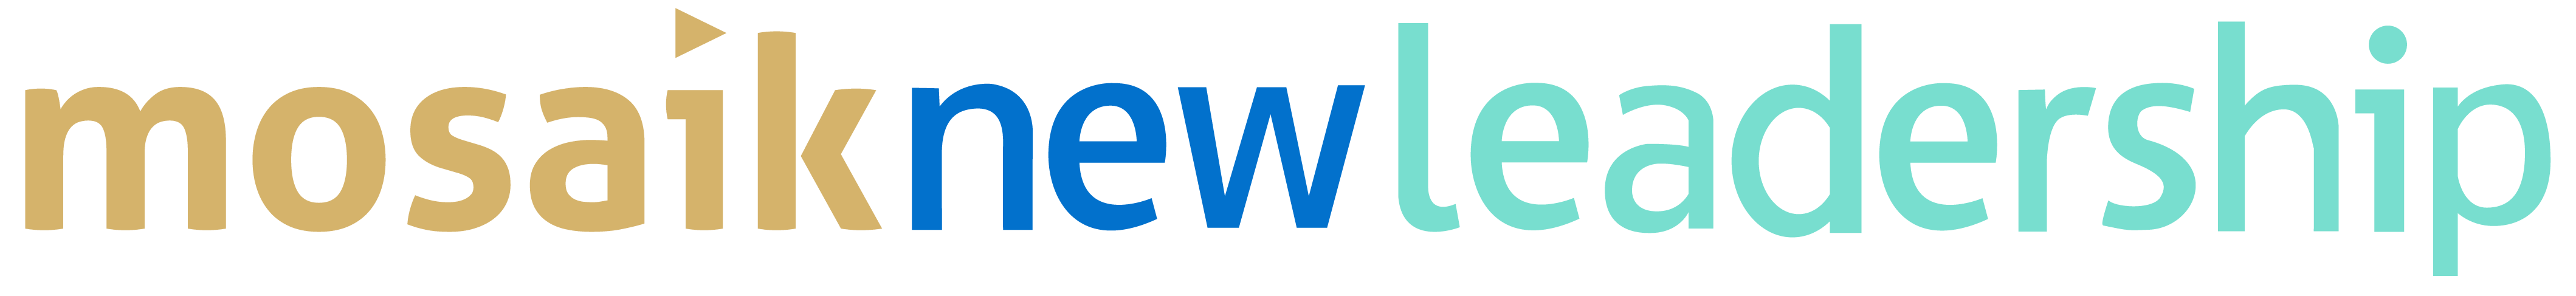 mosaik new leadership Logo